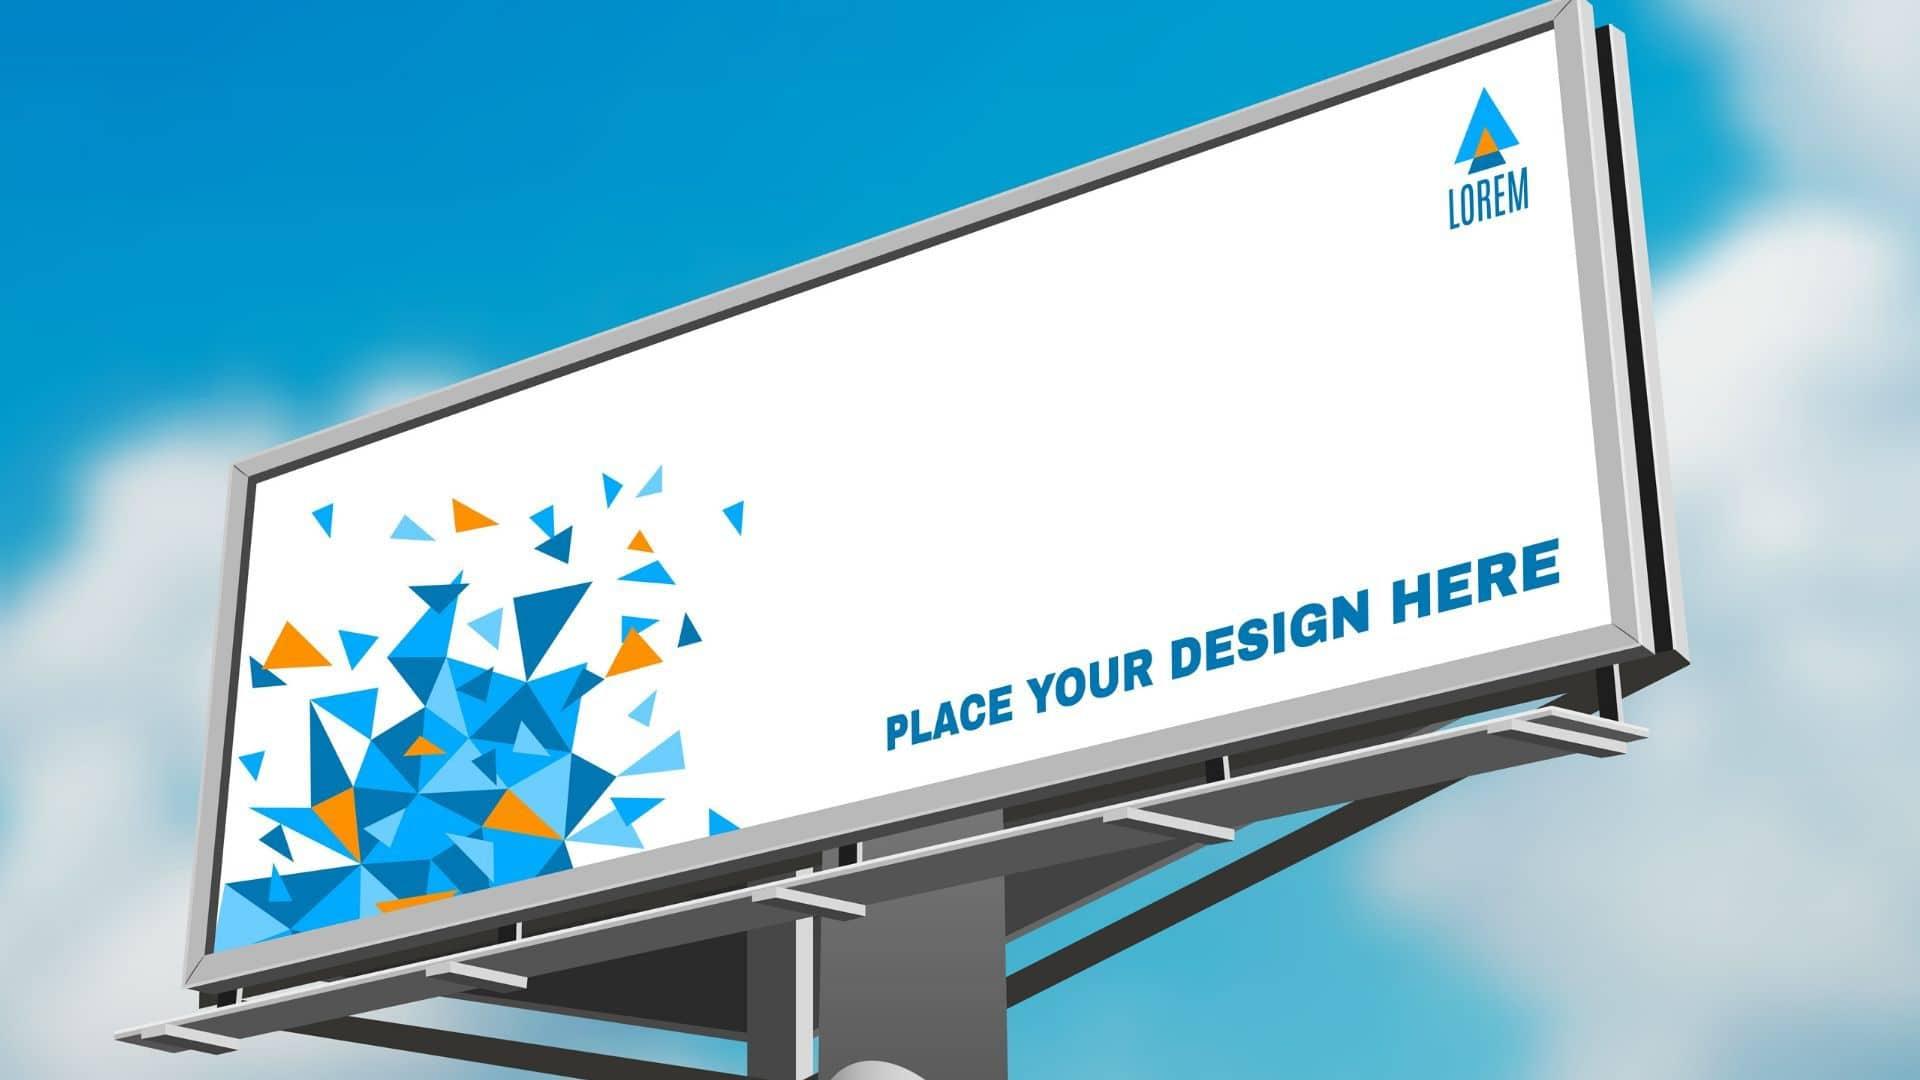 Billboard advertising